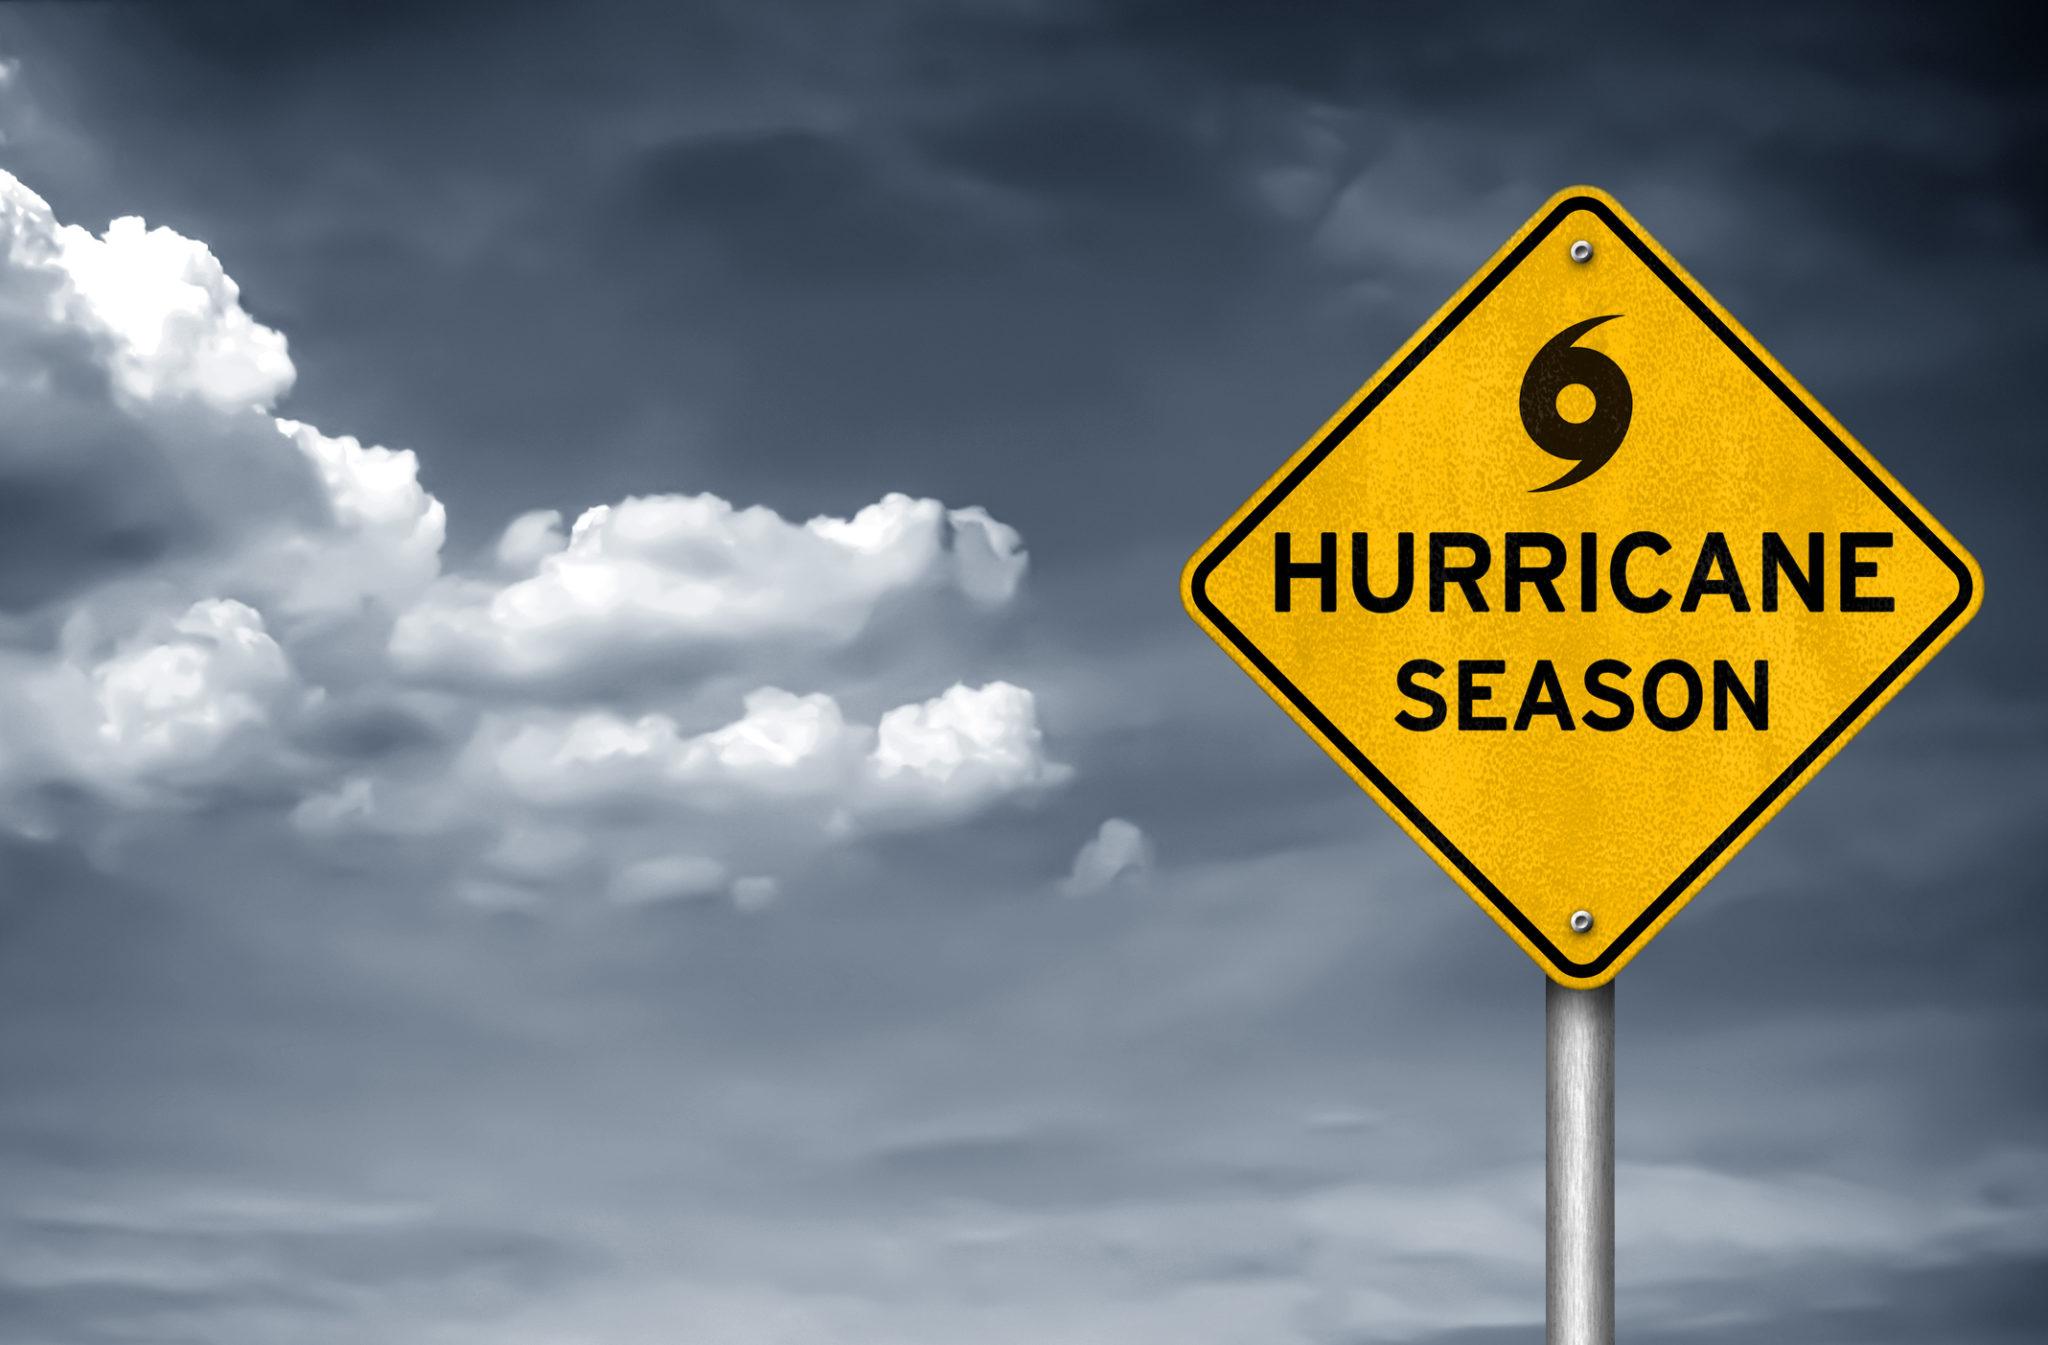 Florida Hurricane Preparation: Evacuation Zones, Emergency Kits & Accommodations